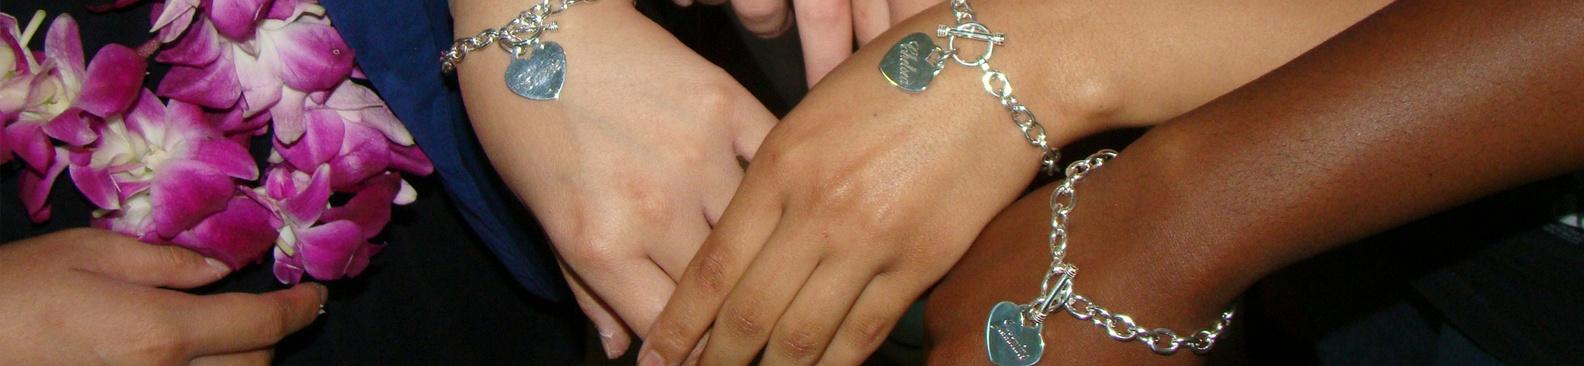 1584x366_guild_bracelets.jpg